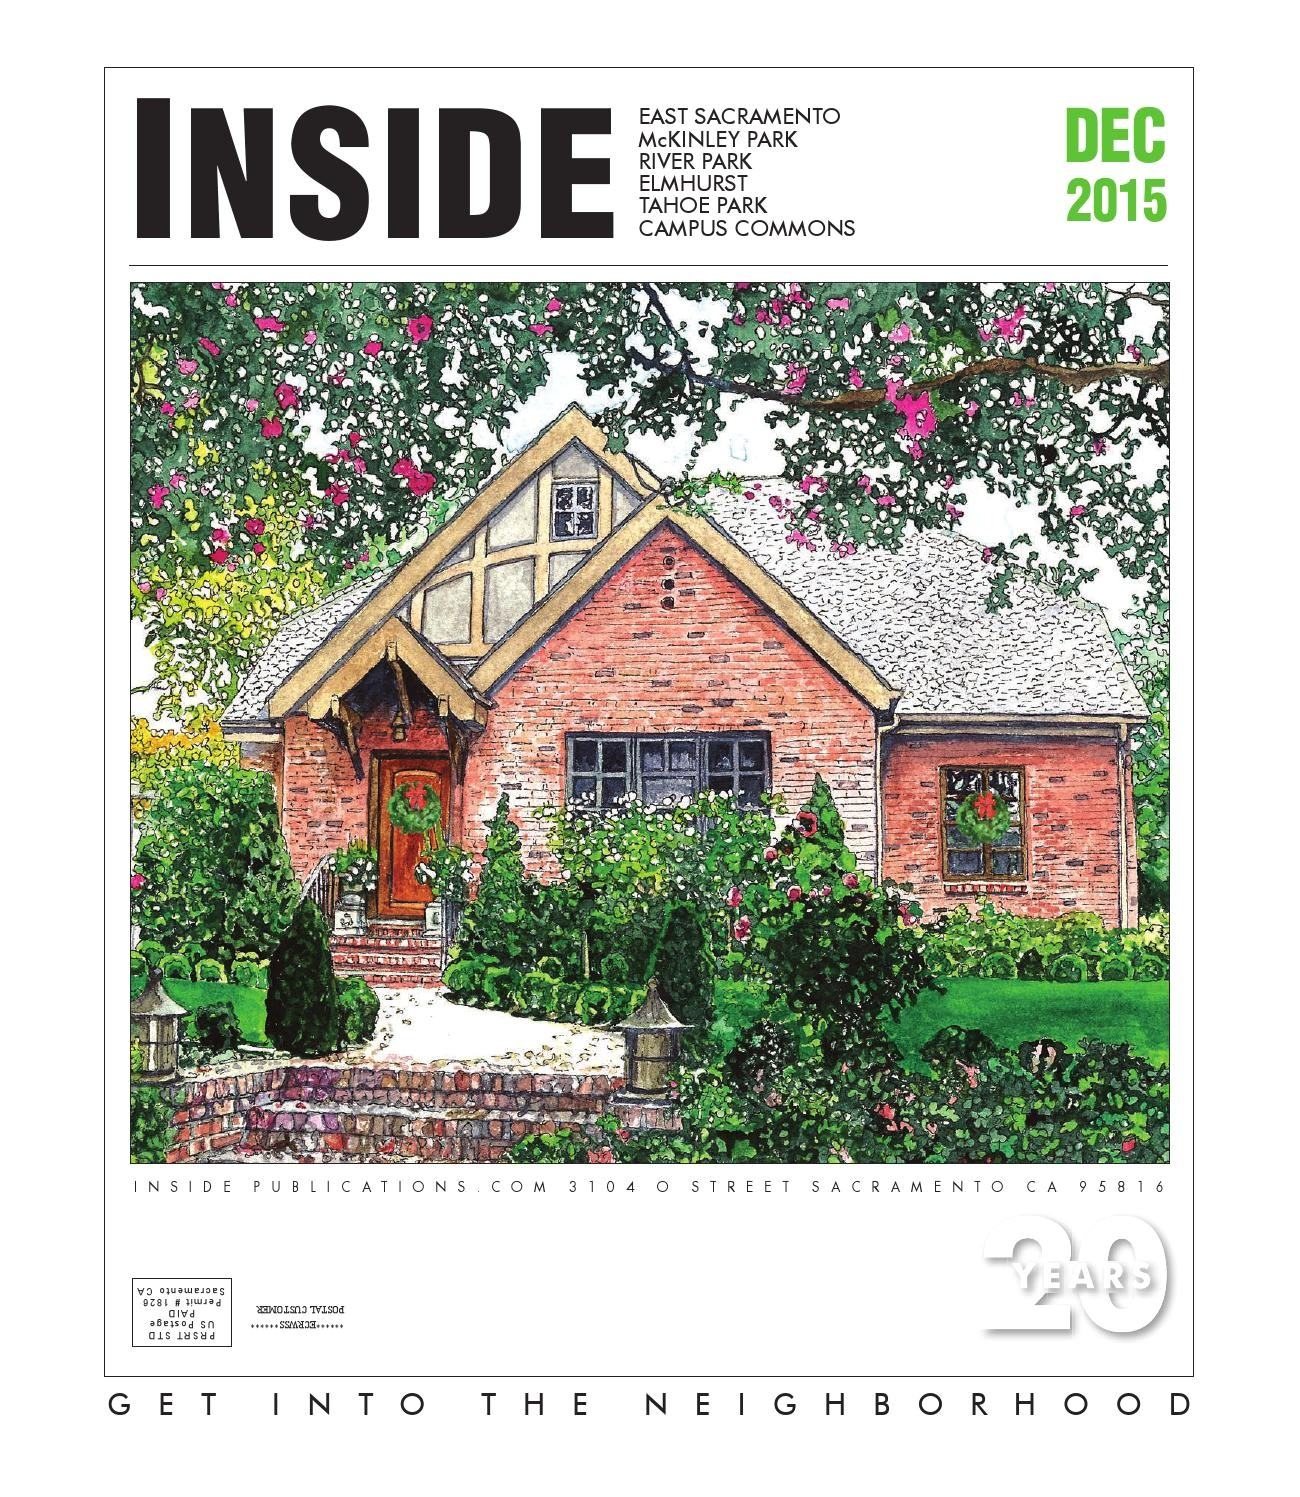 The sofa Warehouse Arden and Watt 3541 Arden Way Sacramento Ca 95864 Inside East Sacramento Dec 2015 by Inside Publications issuu